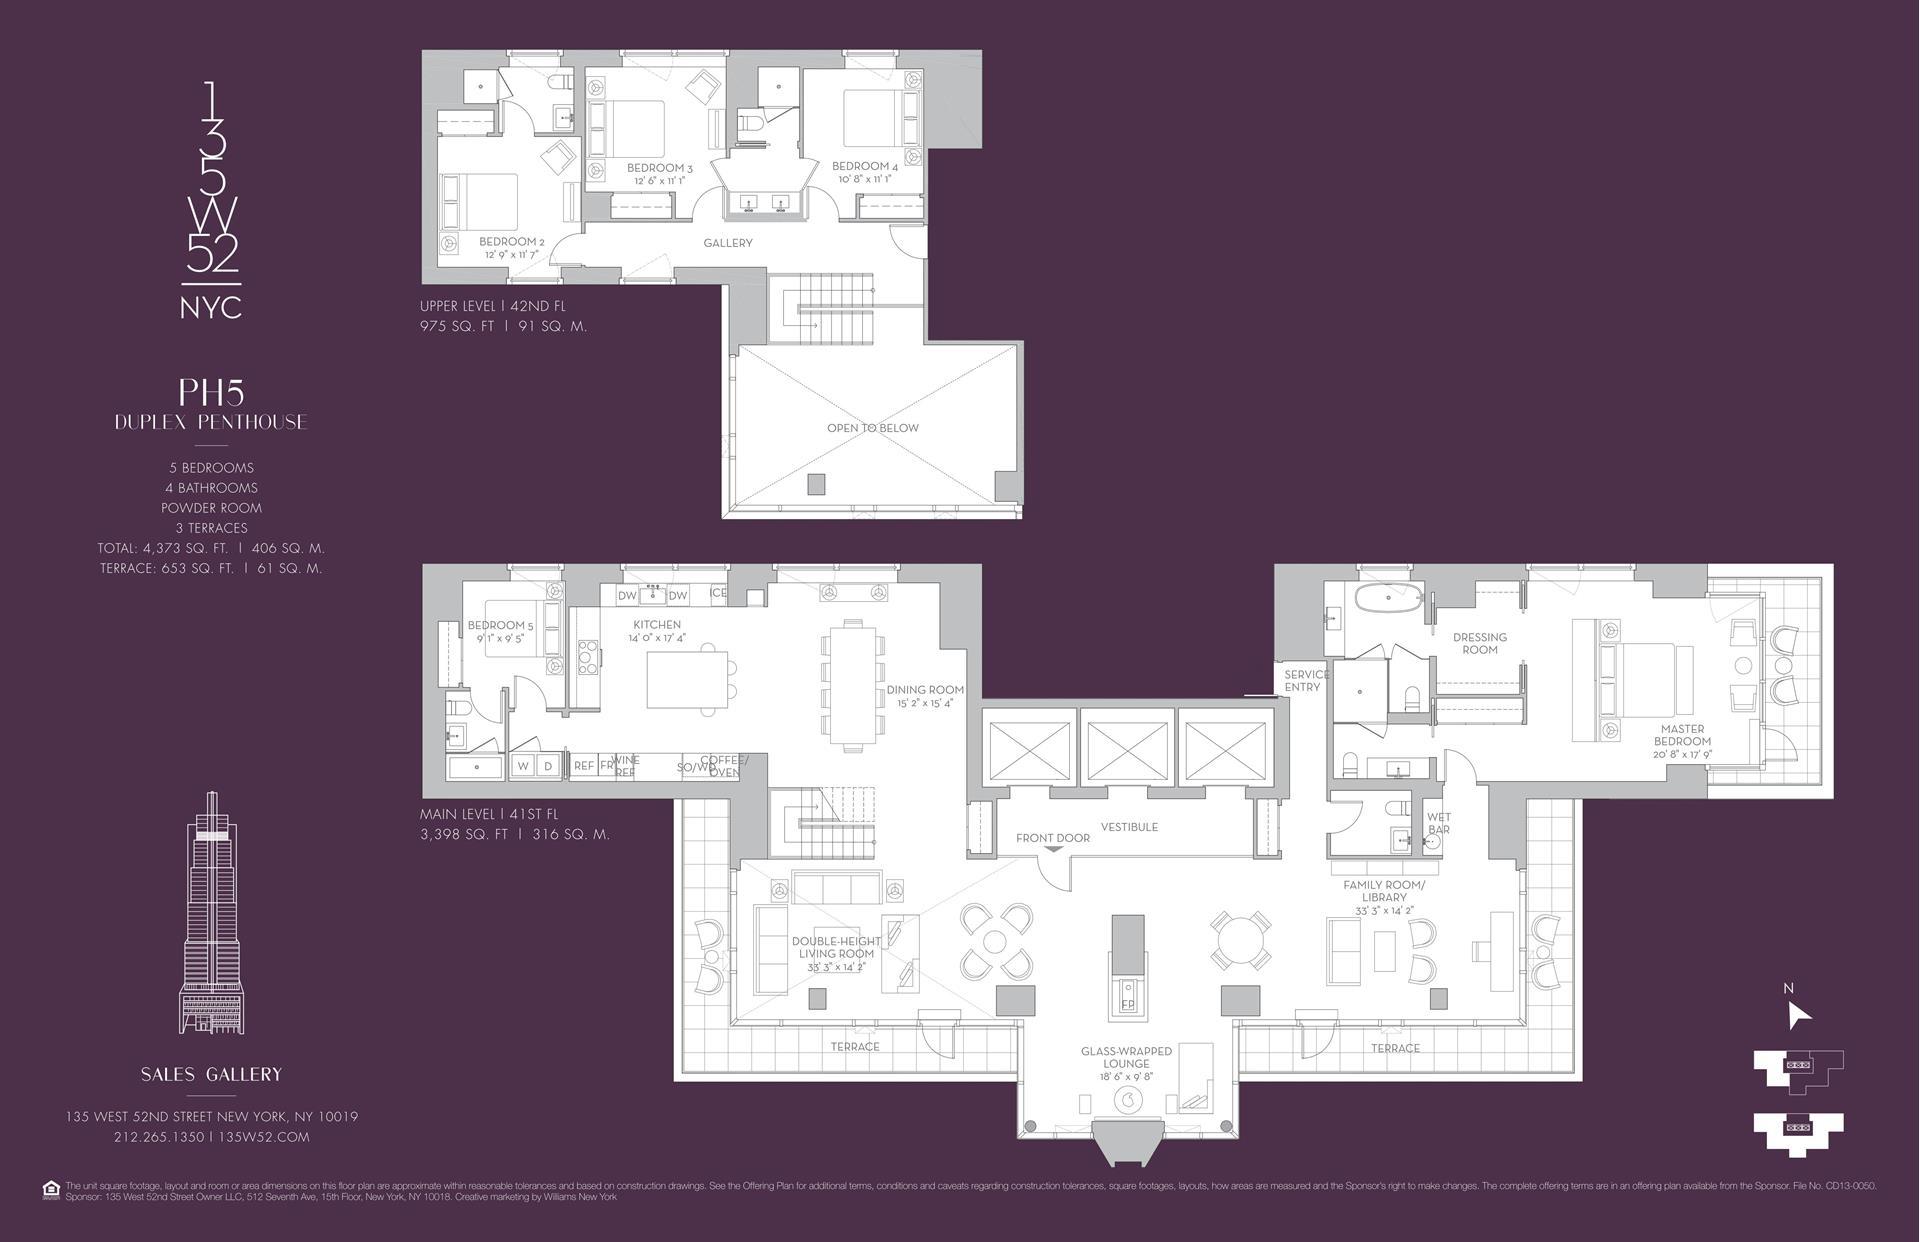 Floor plan of 135 West 52nd Street, PH5 - Midtown, New York